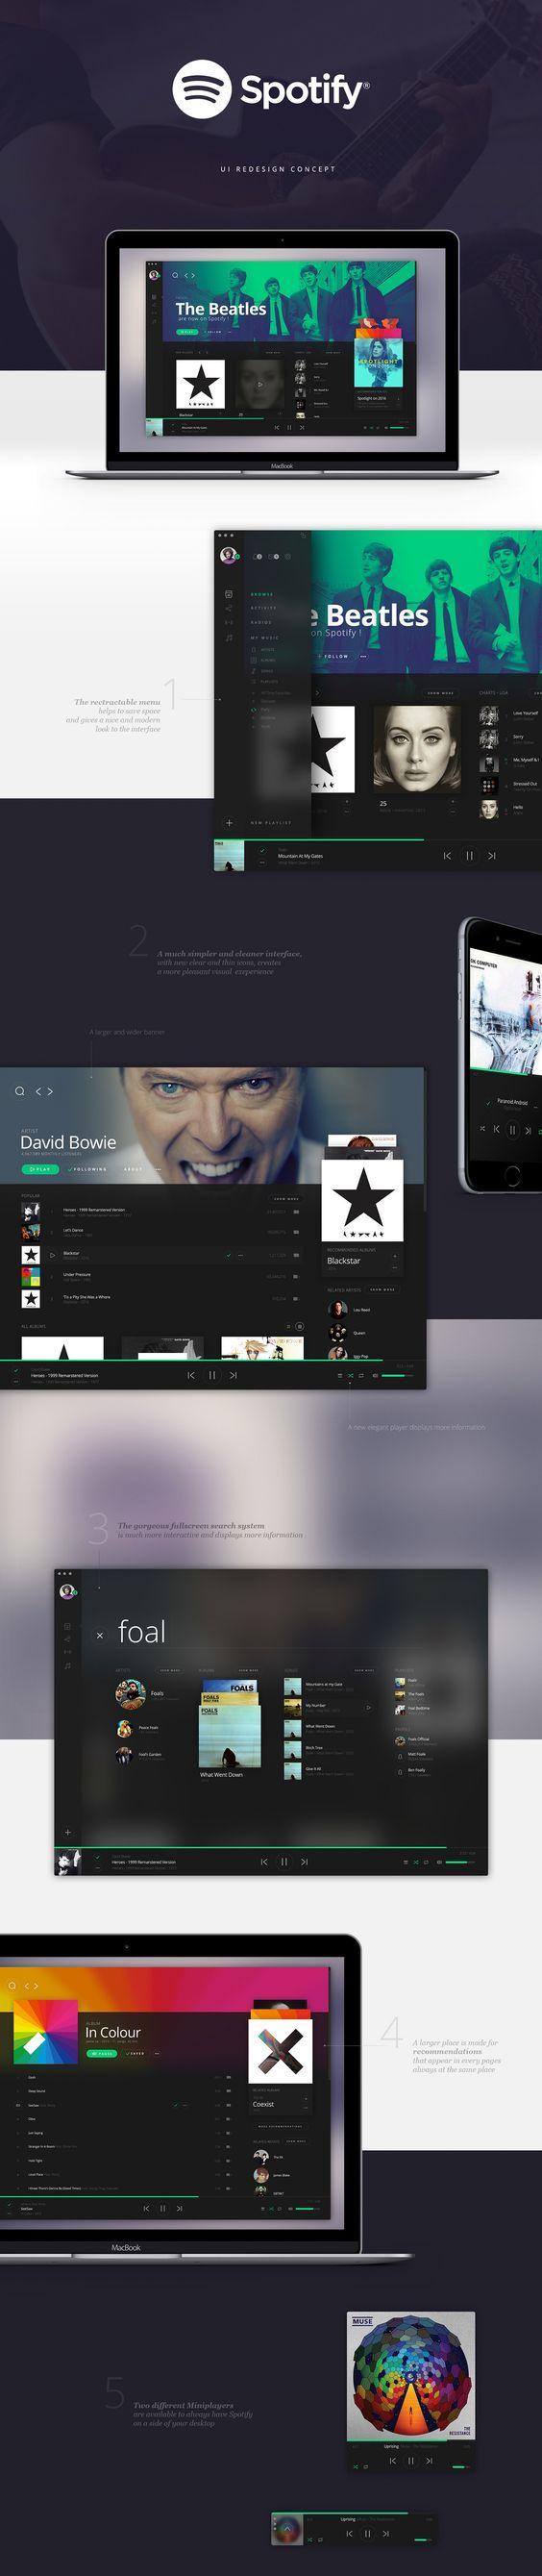 Redesign concepts for popular websites #4 — Muzli -Design Inspiration — Medium: